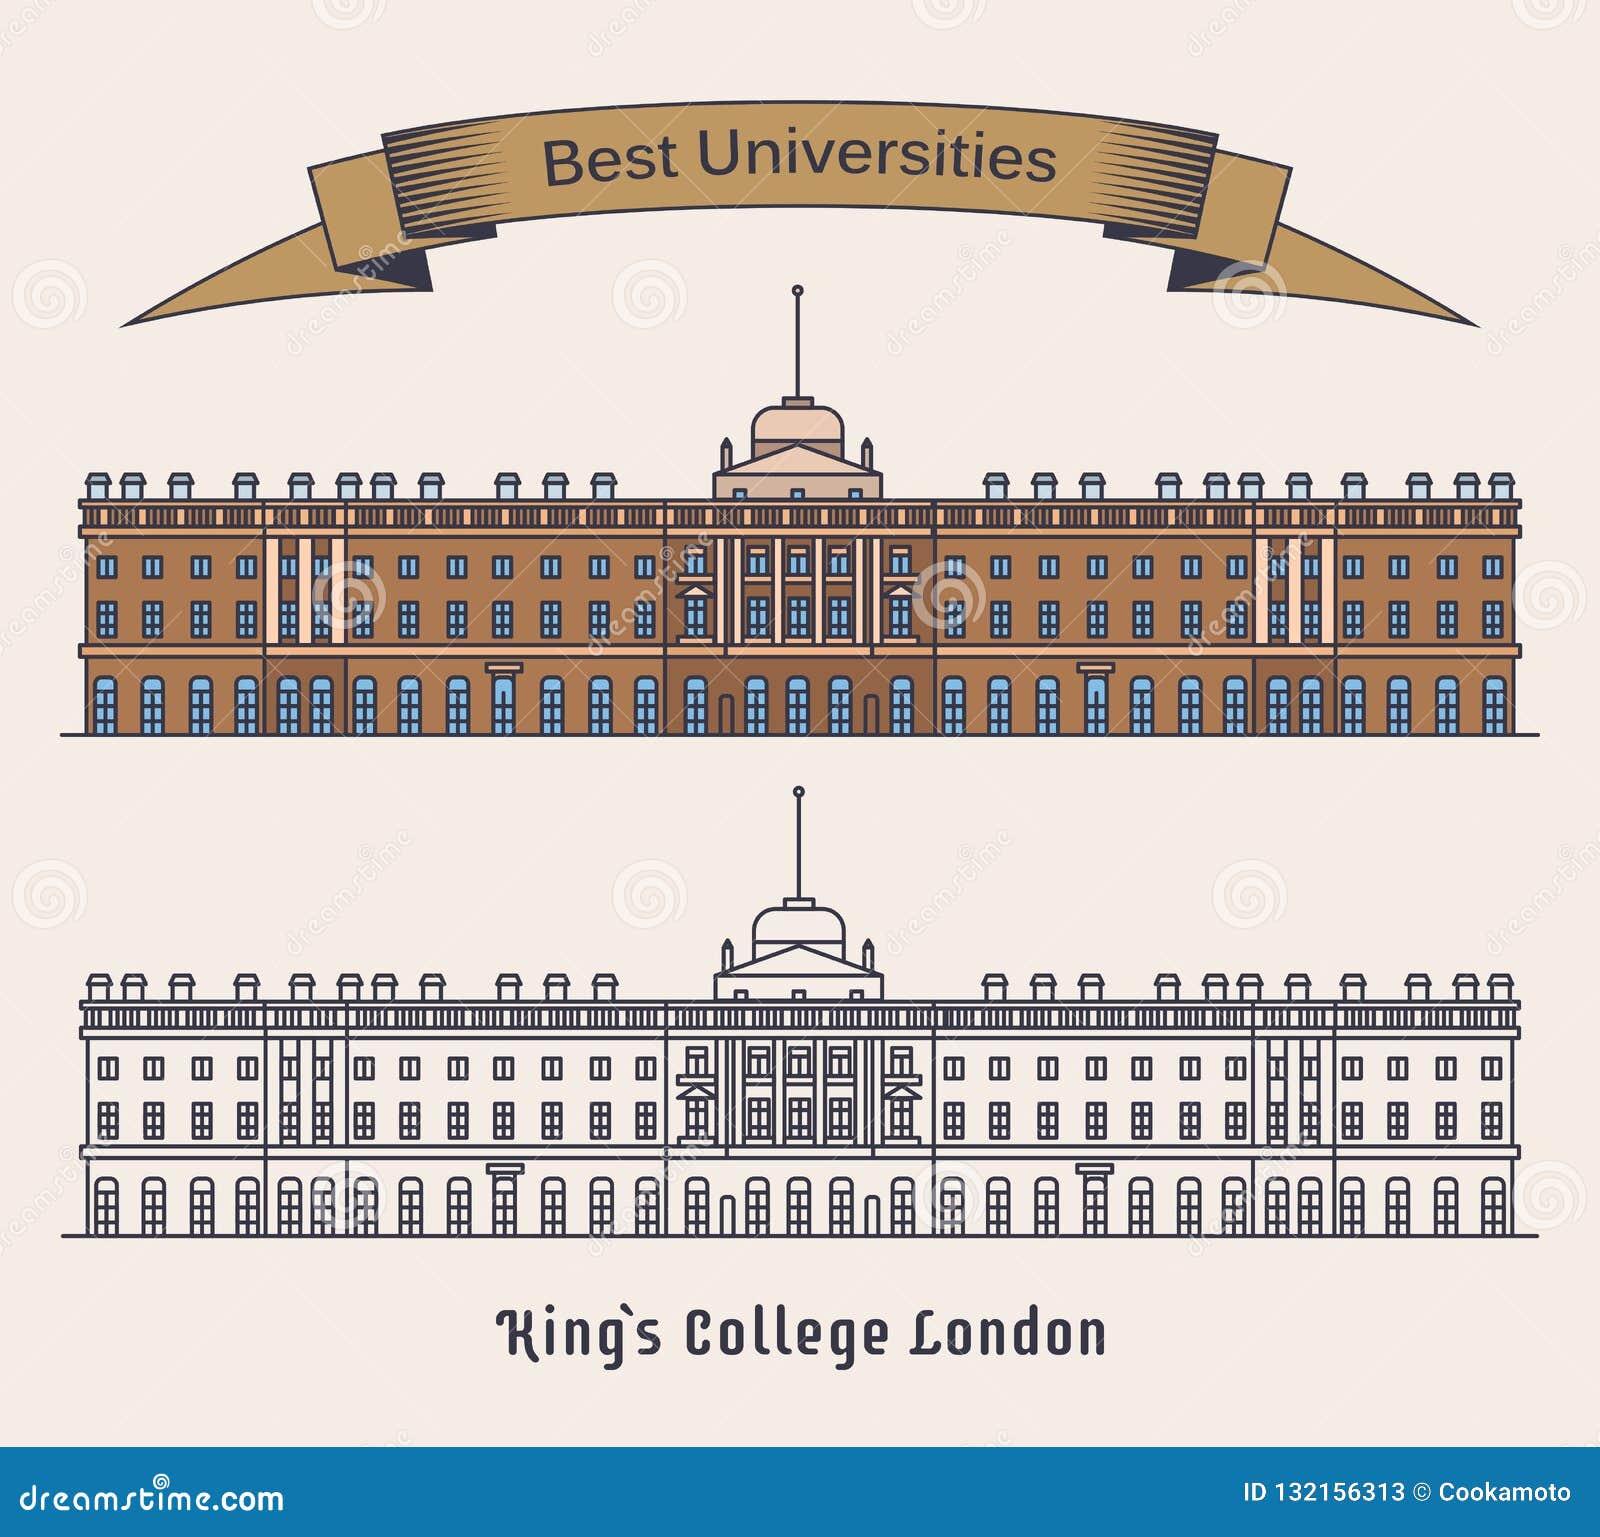 KCL Londyn lub kings college Uniwersytet w Anglia